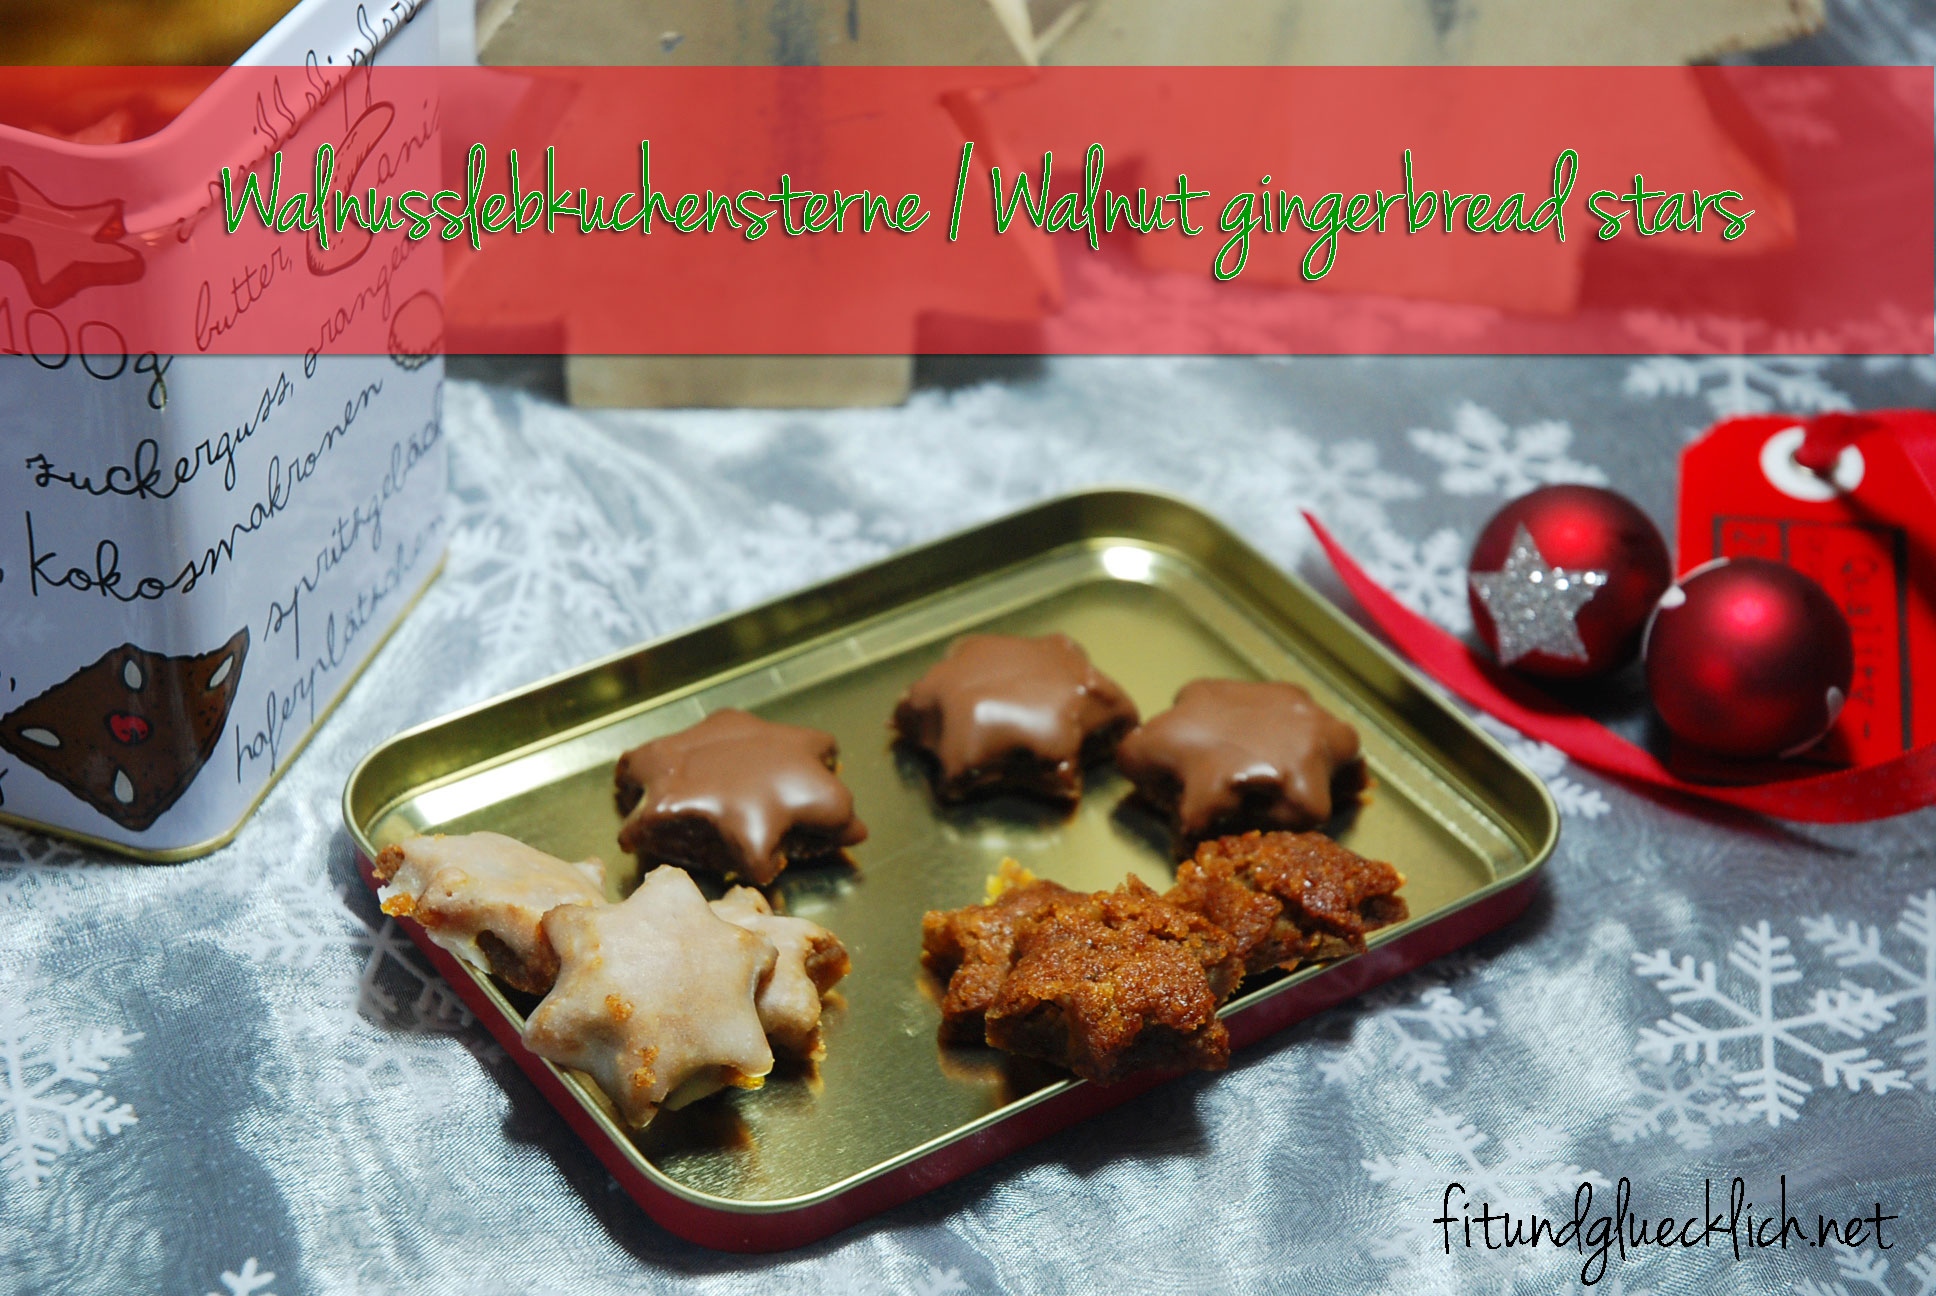 Walnuss-Lebkuchensterne / Walnut Gingerbread stars